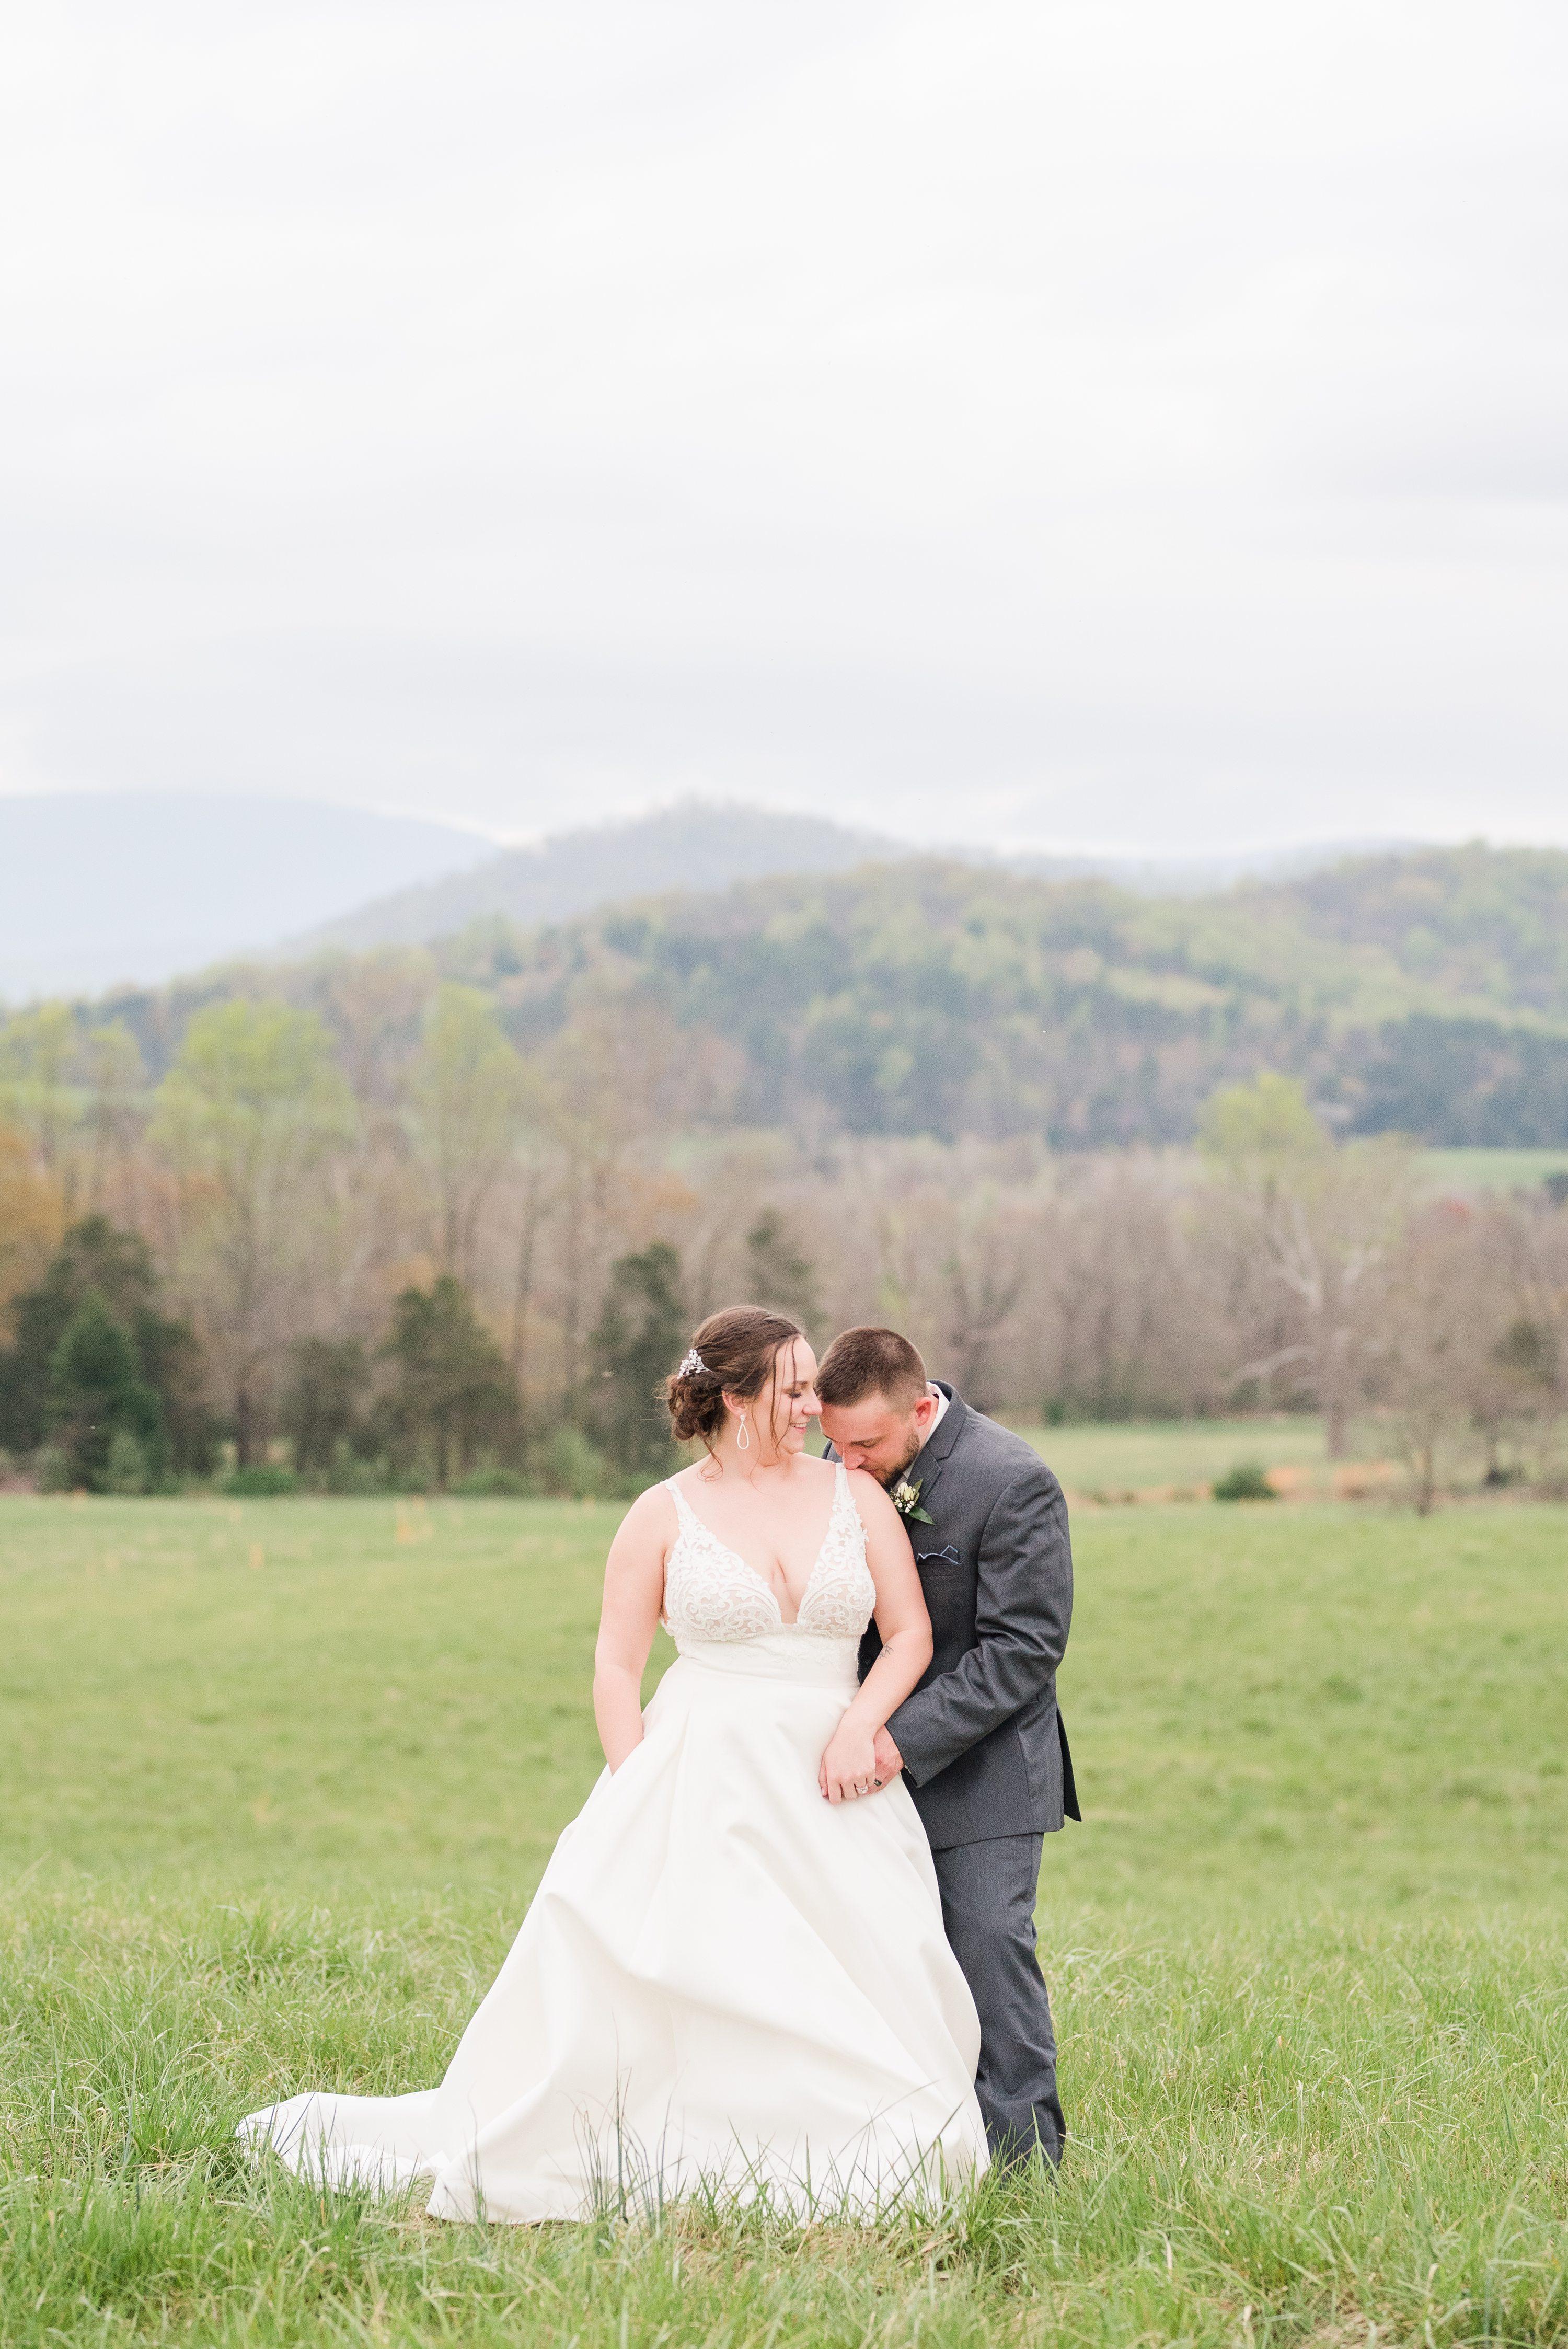 Barn,Edgewood,Blue Ridge Mountains,bride and groom,edgewood barn,Barn at Edgewood